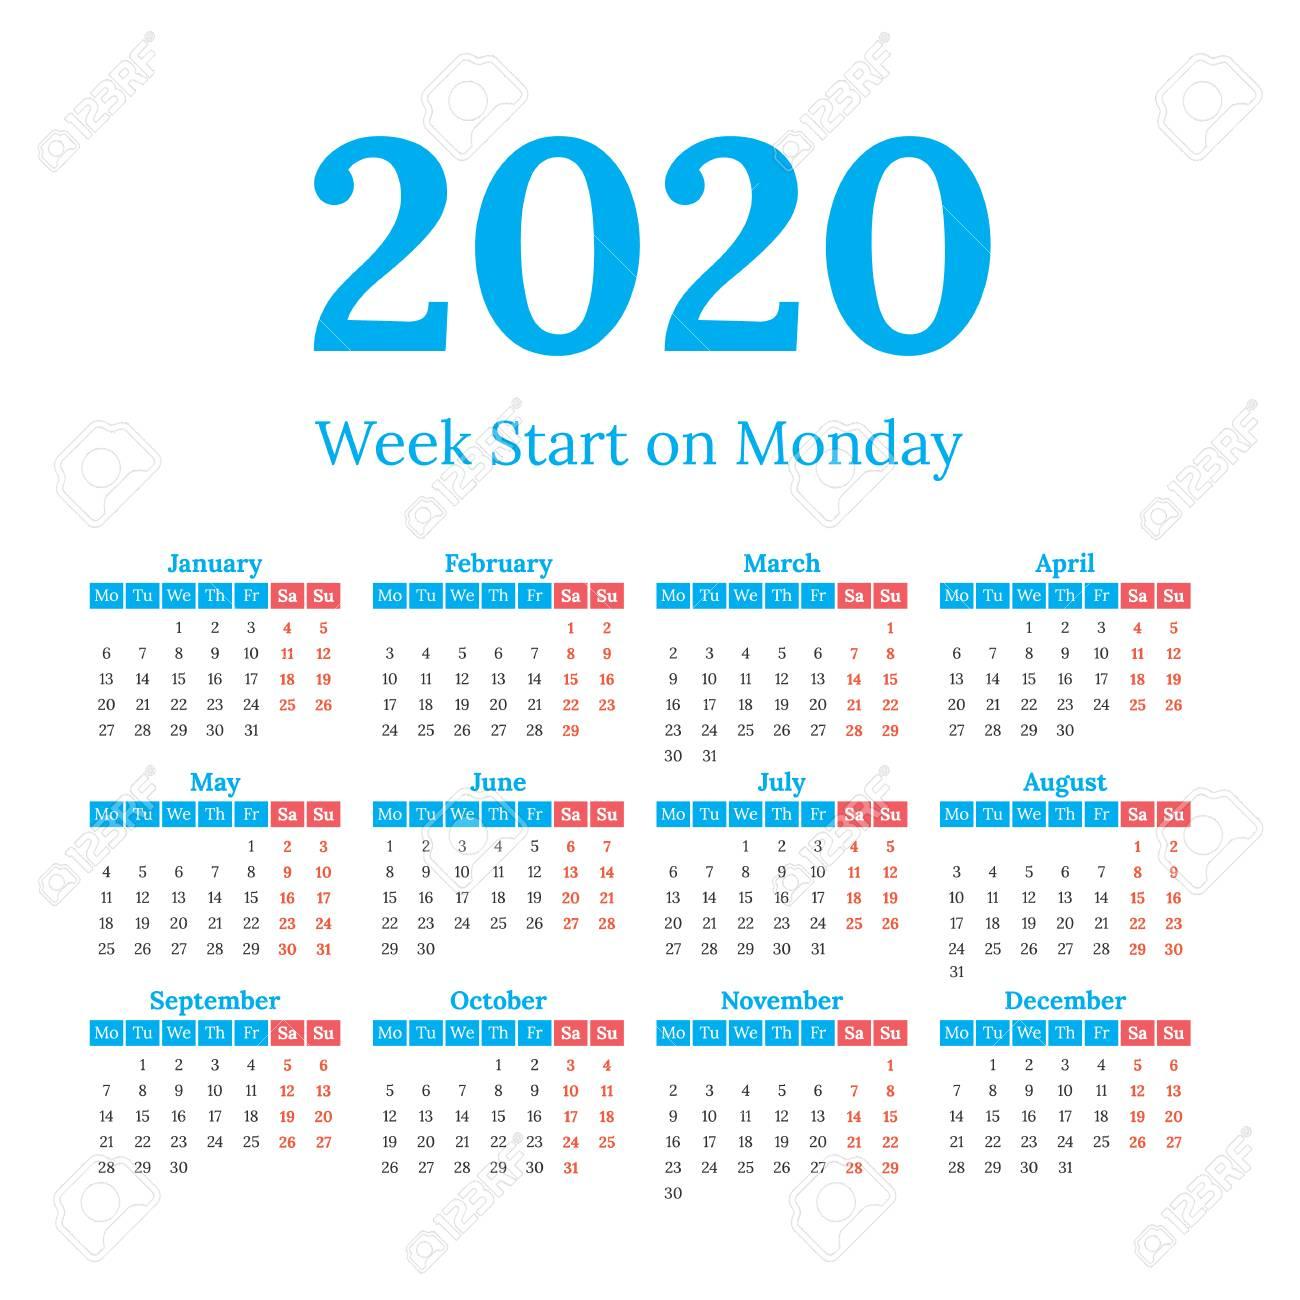 2020 Year Vector Calendar. Weeks Start On Monday